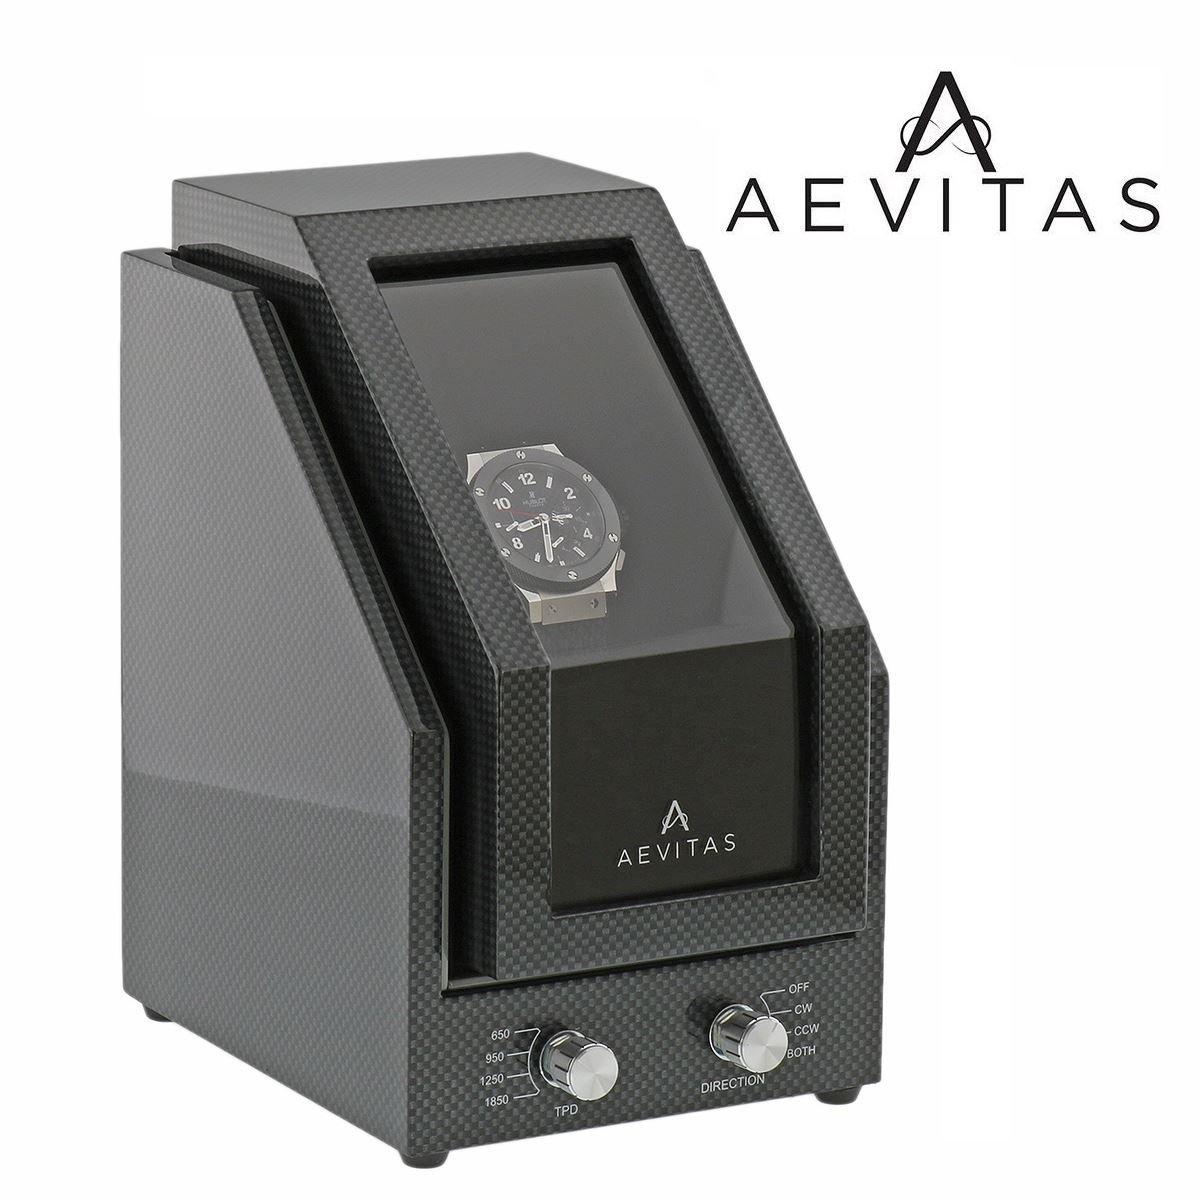 Brand New Watch Winder for 1 Watch Carbon Fibre Finish Black Velvet interior Premier Range by Aevitas